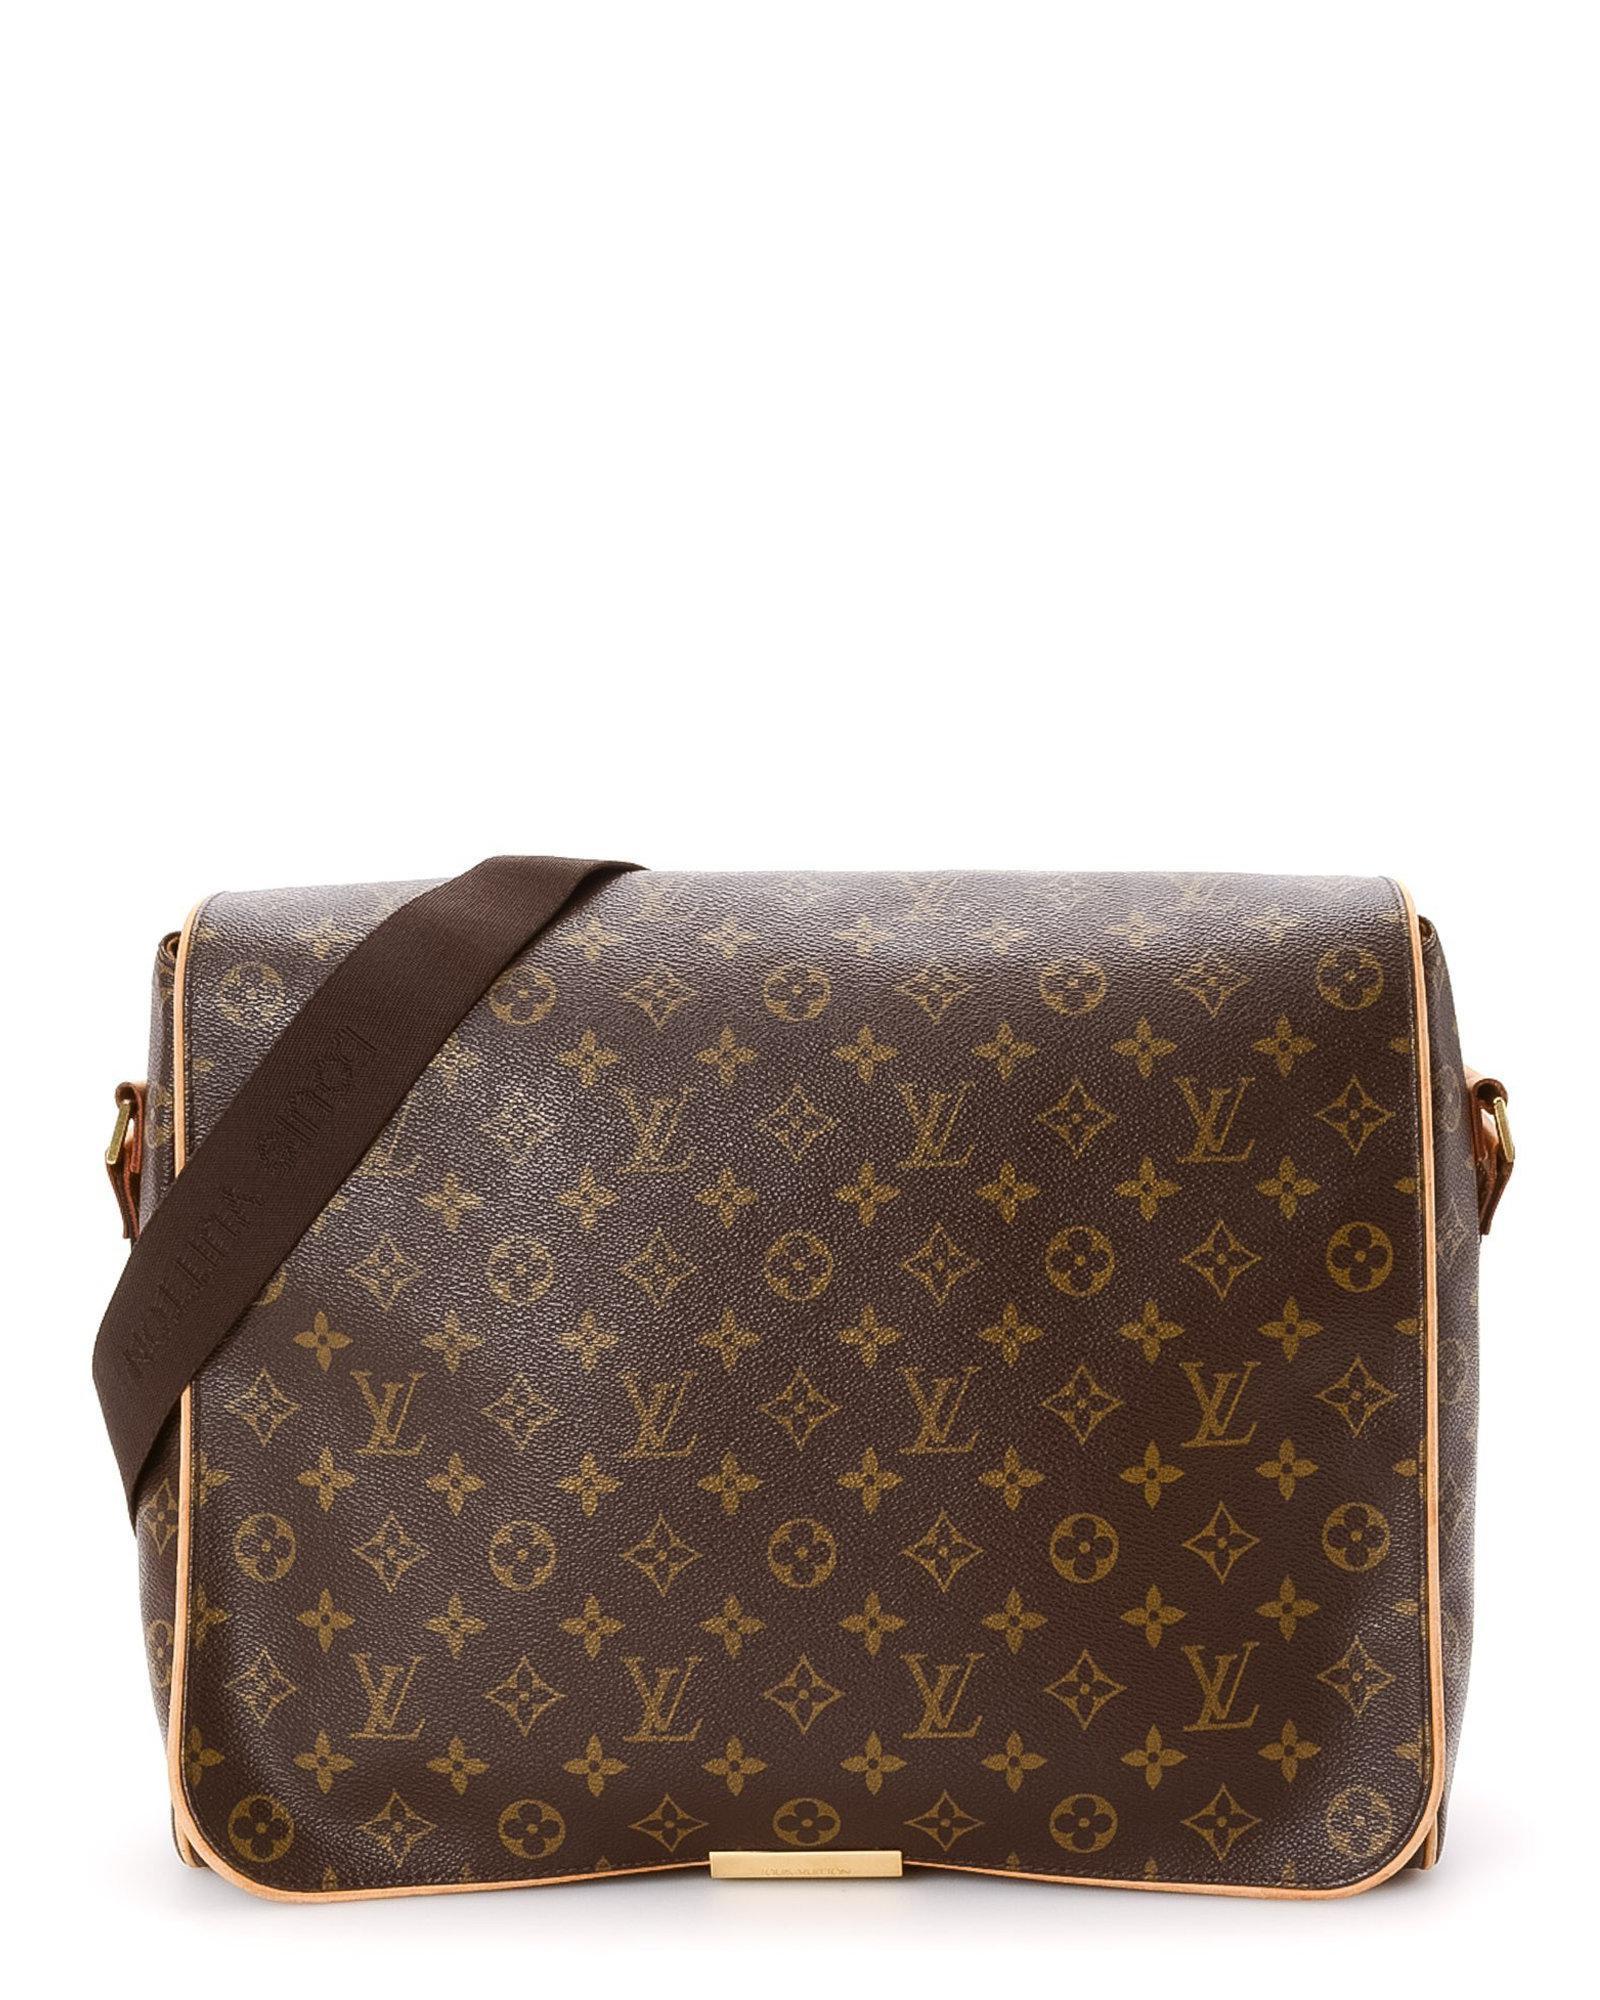 ac8b90aa687d Lyst - Louis Vuitton Abbesses Monogram Messenger Bag - Vintage in ...